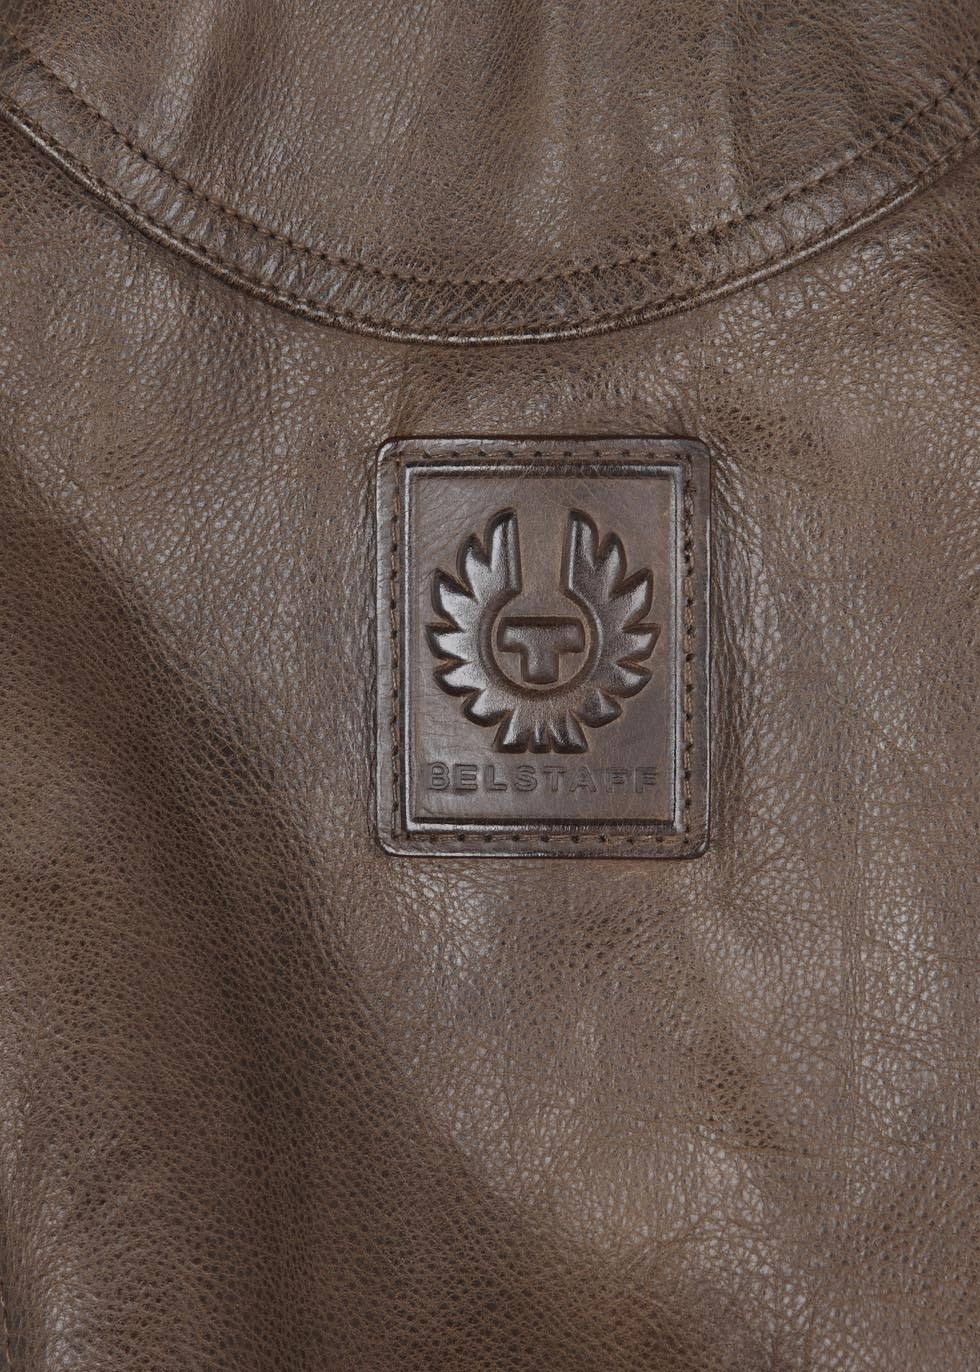 Leather jacket cape town - Leather Jacket Cape Town 28